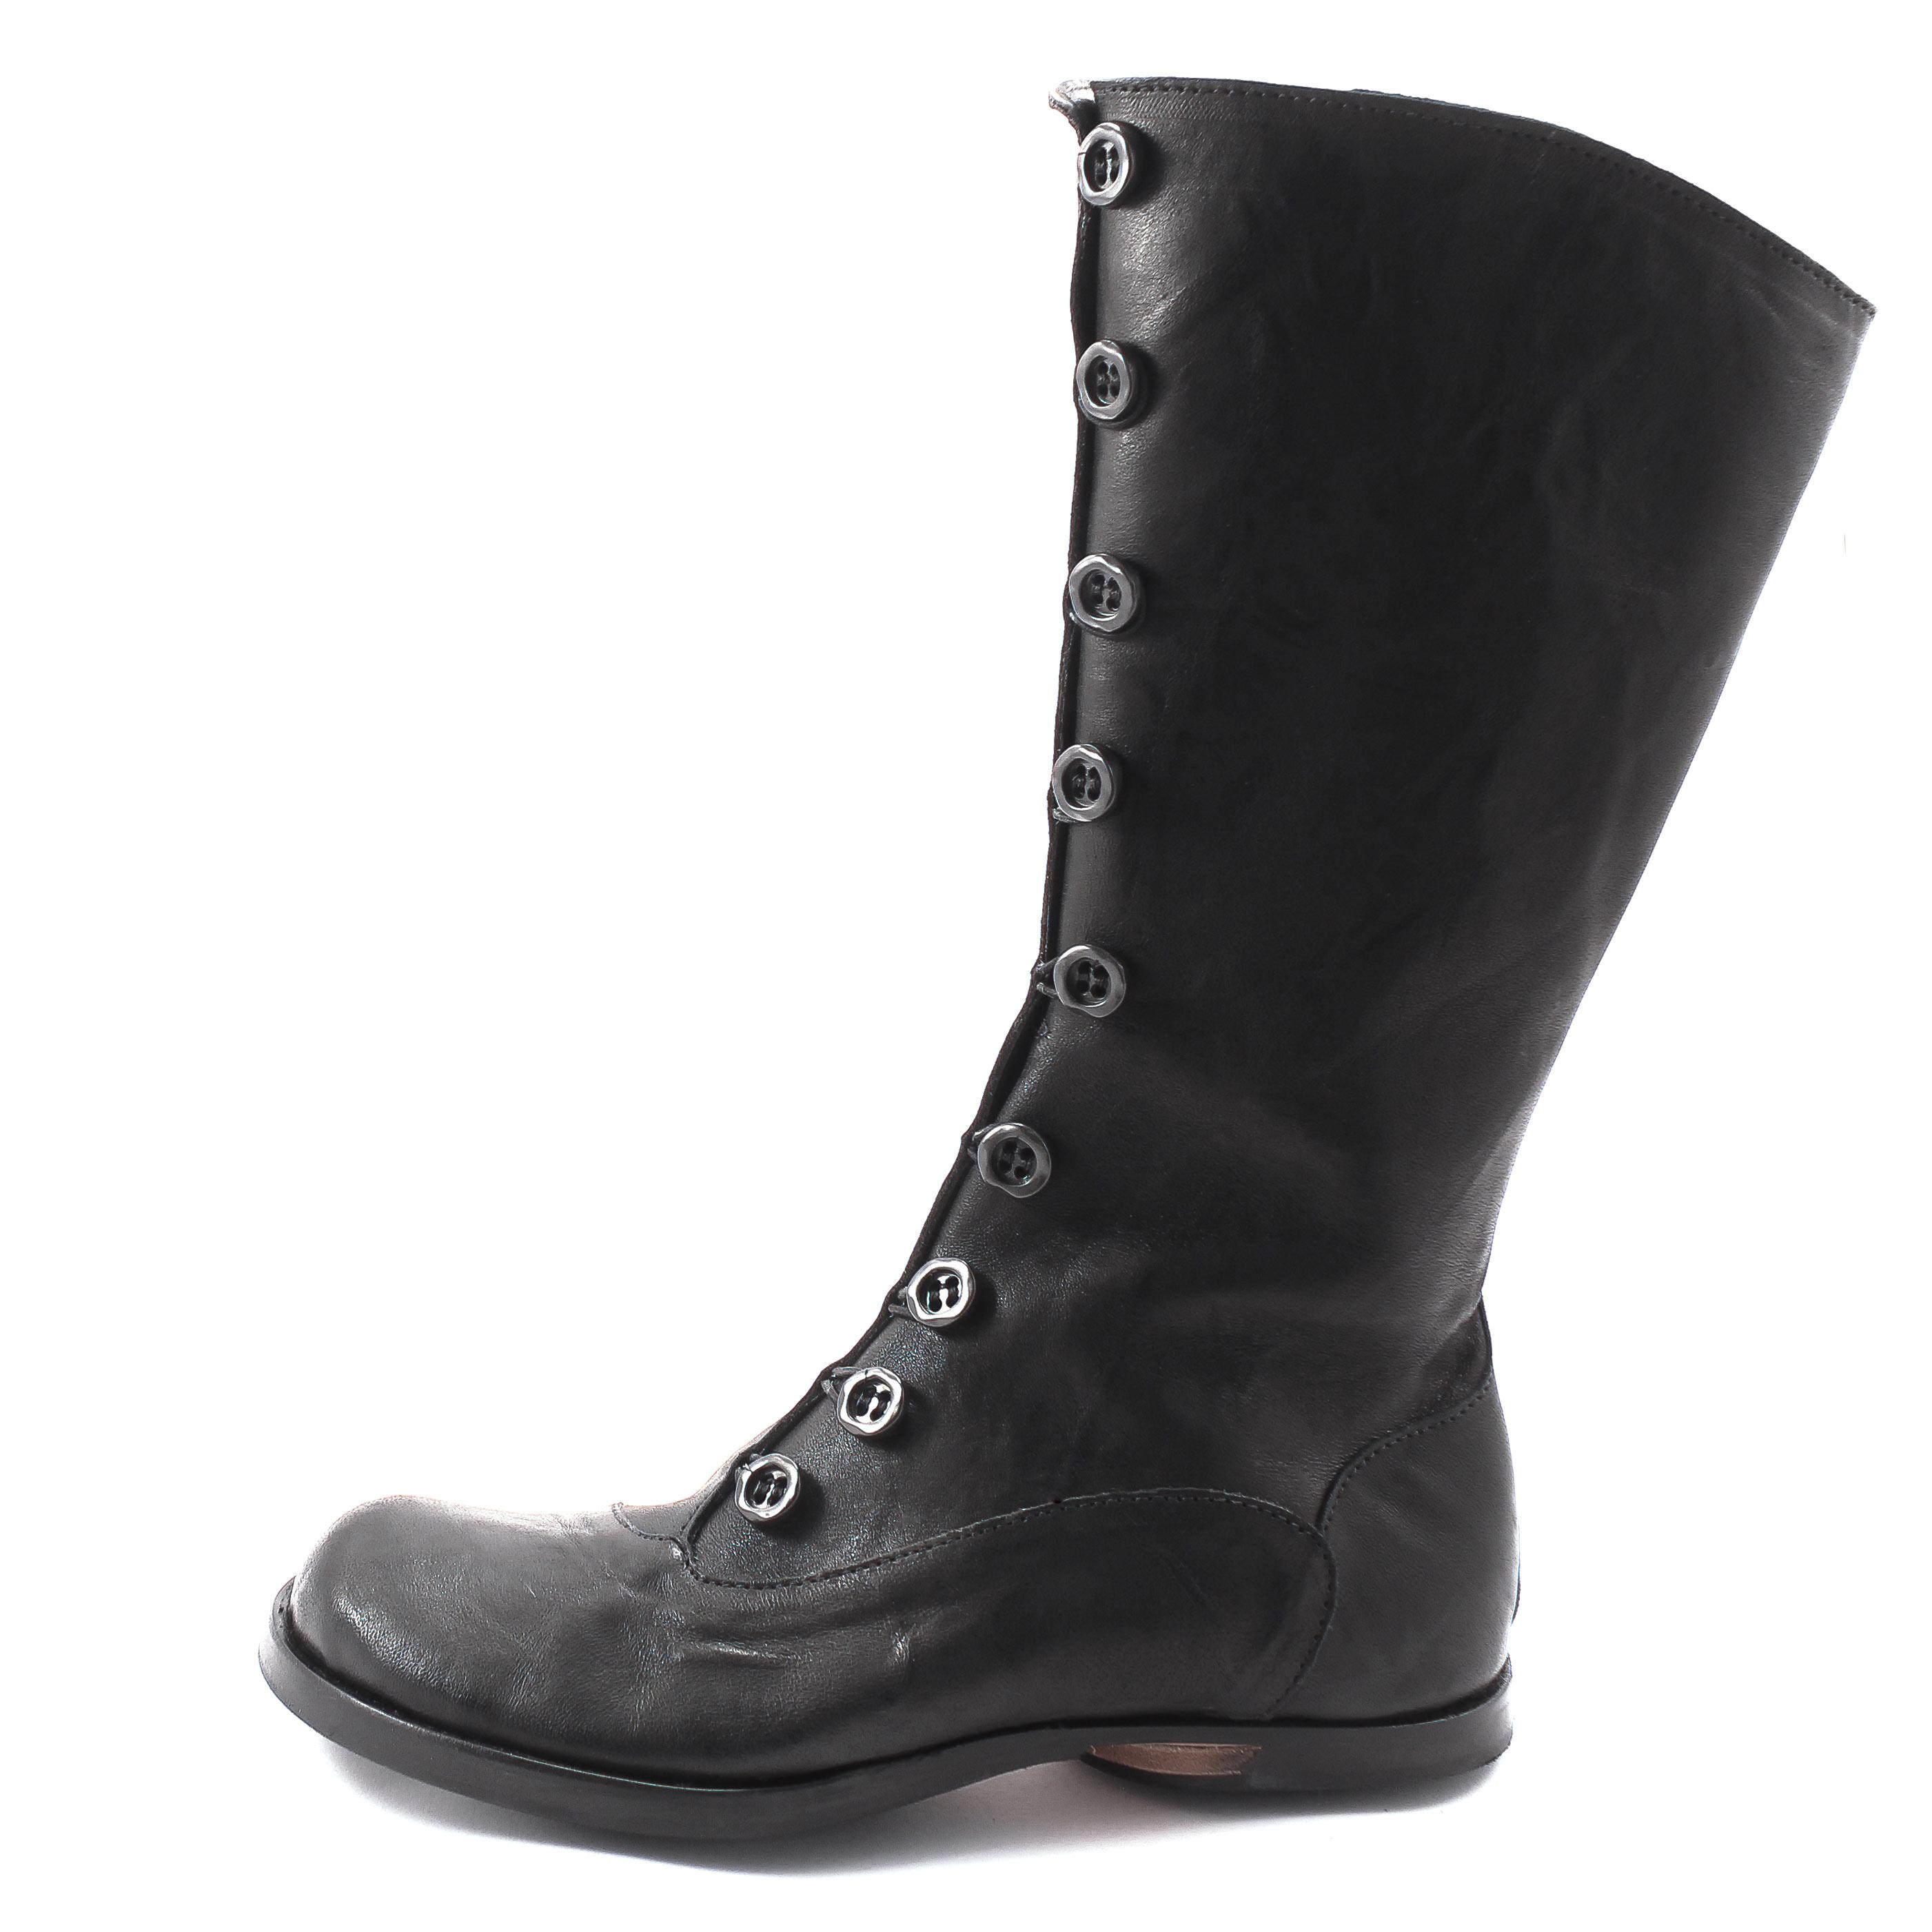 CYDWOQ, Mountain Stiefel Damen, schwarz Grosse 36